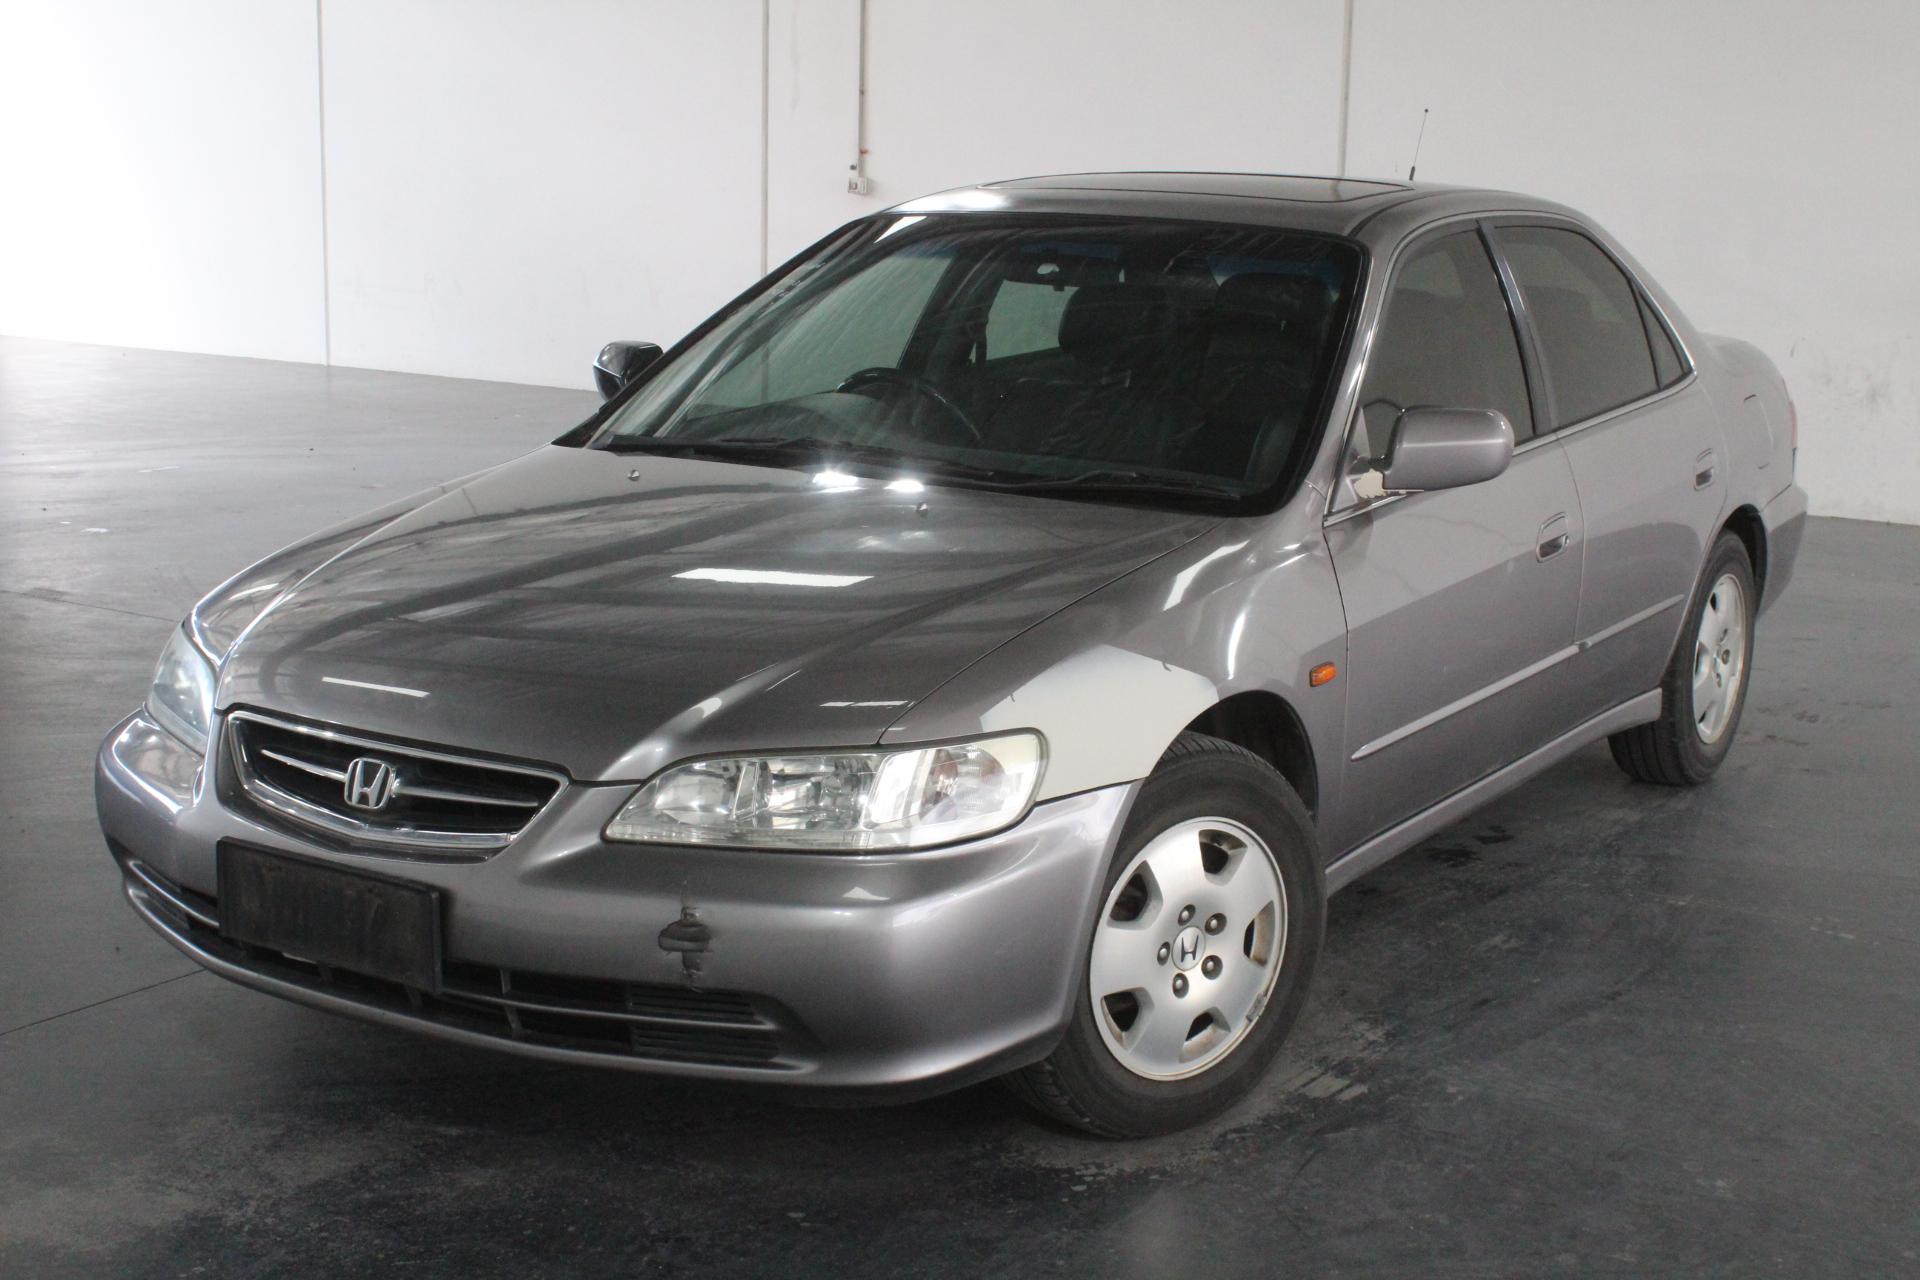 2001 Honda Accord V6-L 6th Gen Automatic Sedan